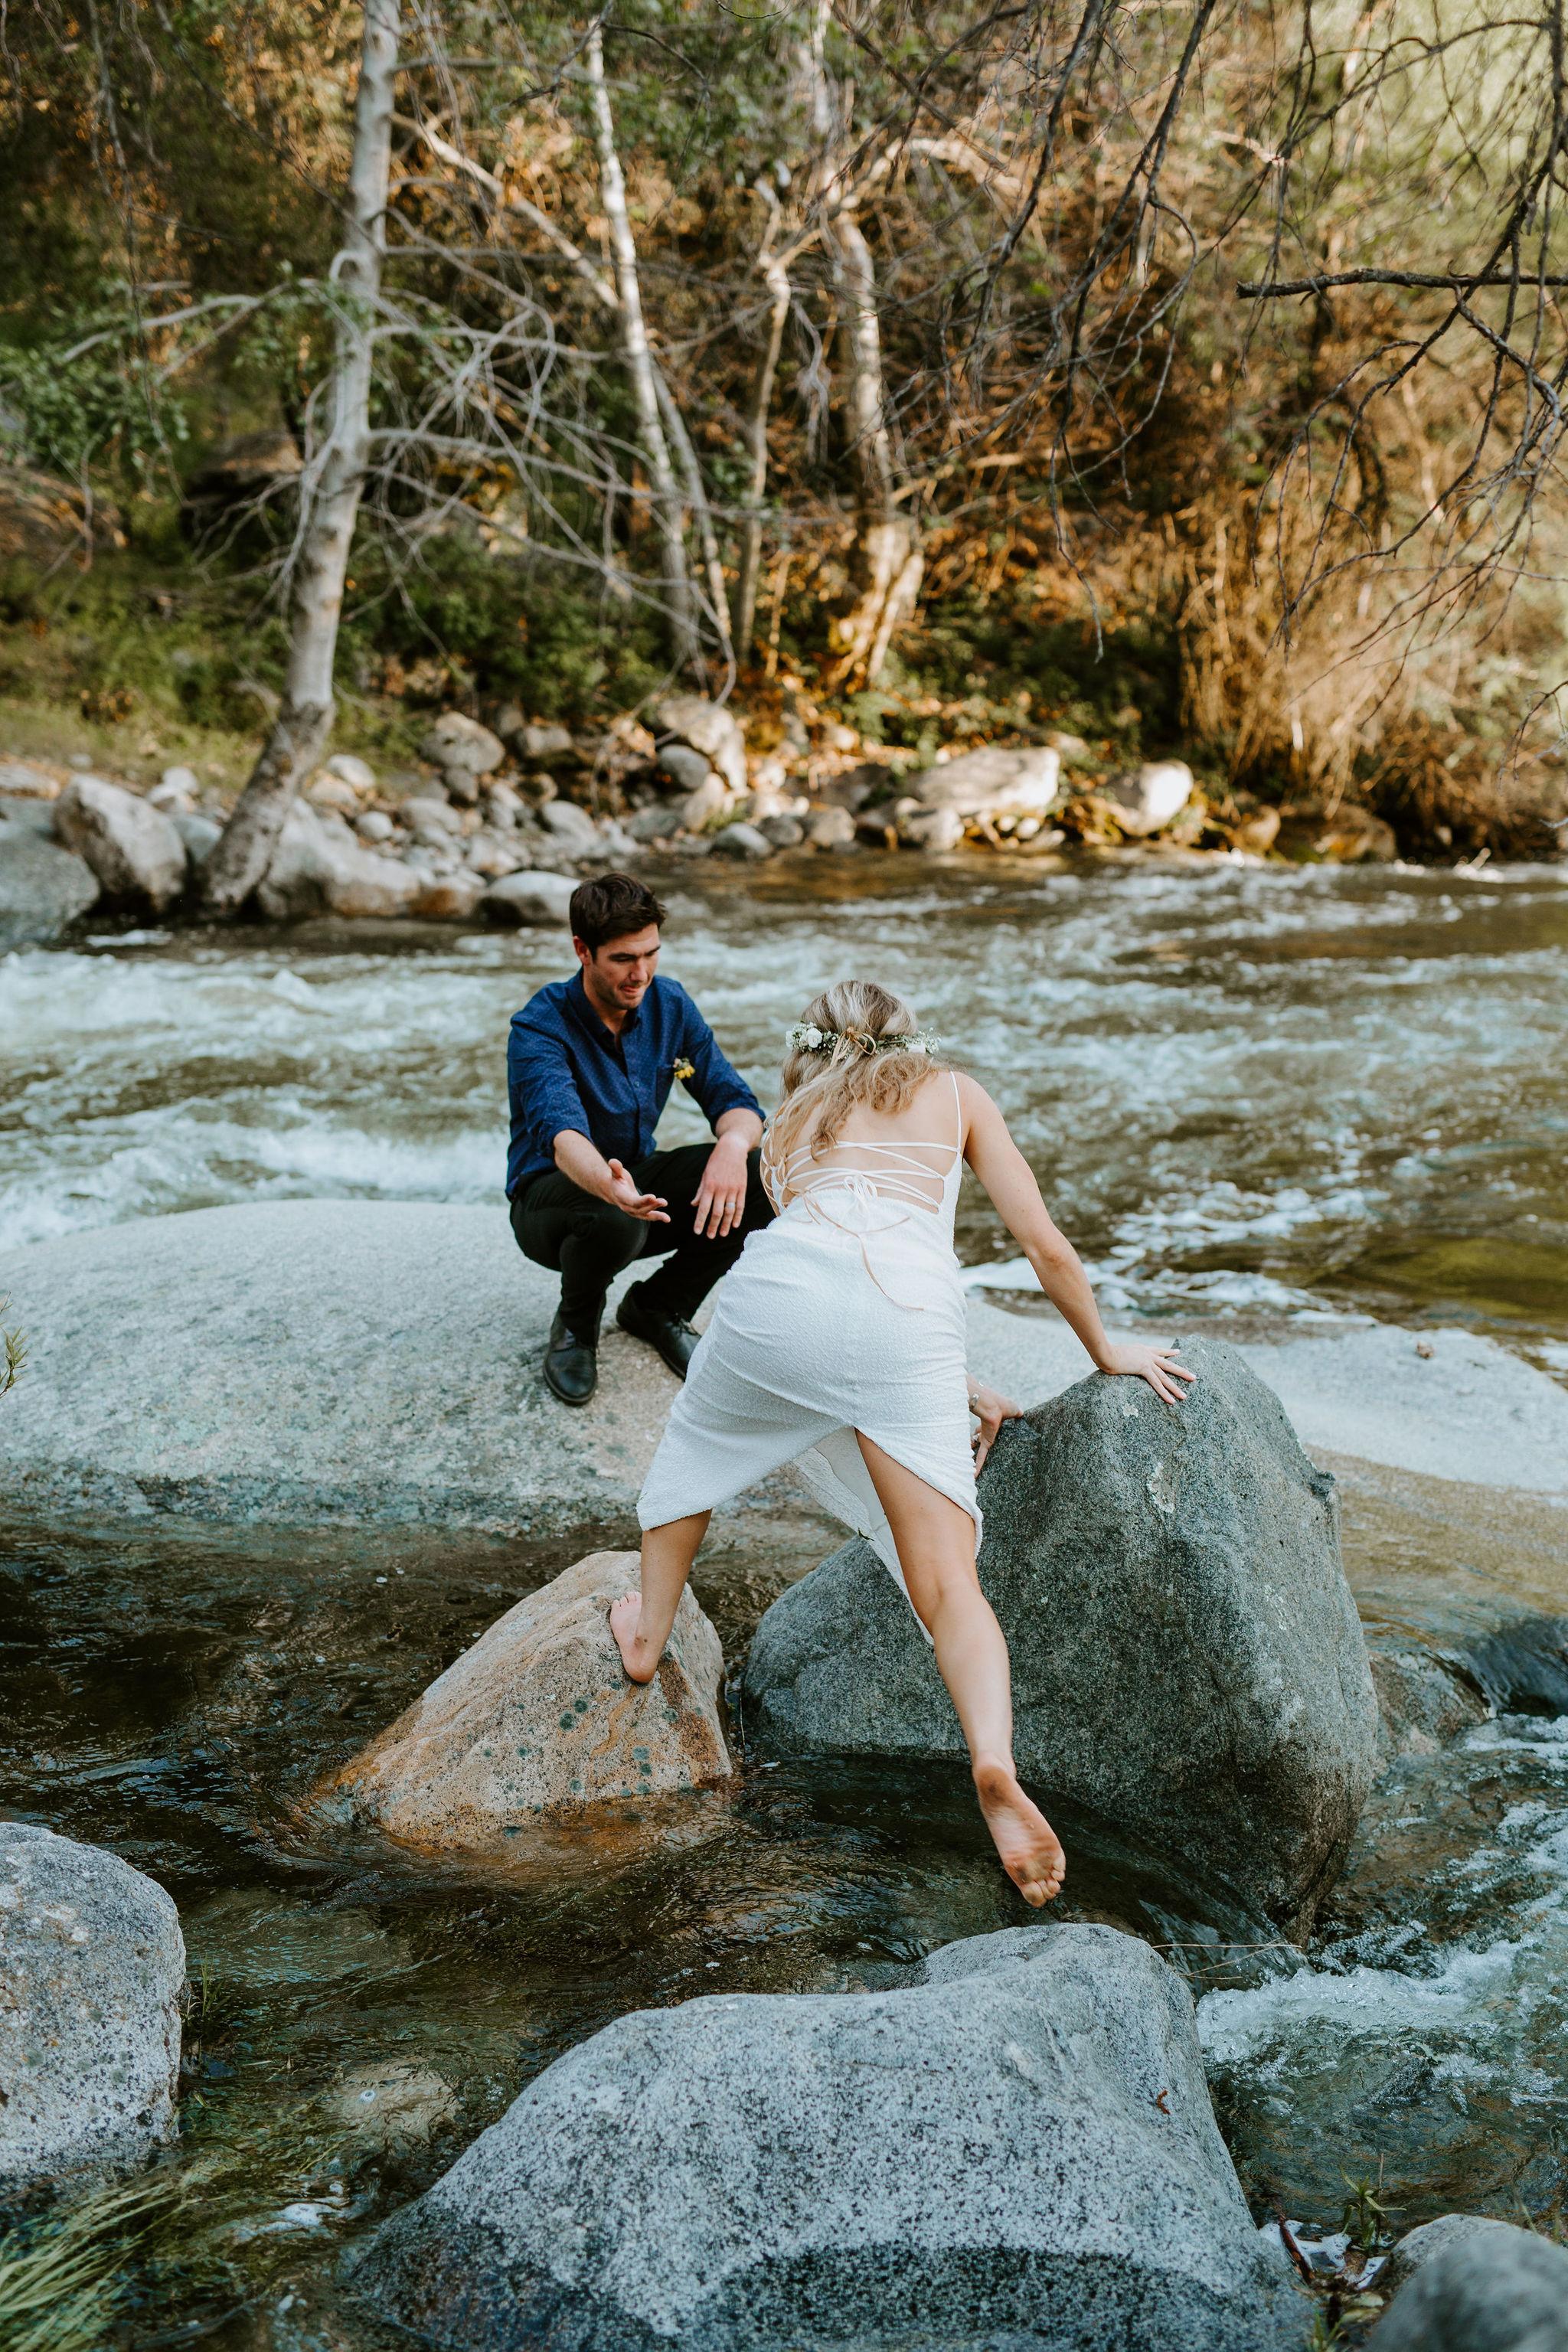 RedwoodRanch_Geoff&LyndsiPhotography_Mike&Amanda_Romantics66.jpg